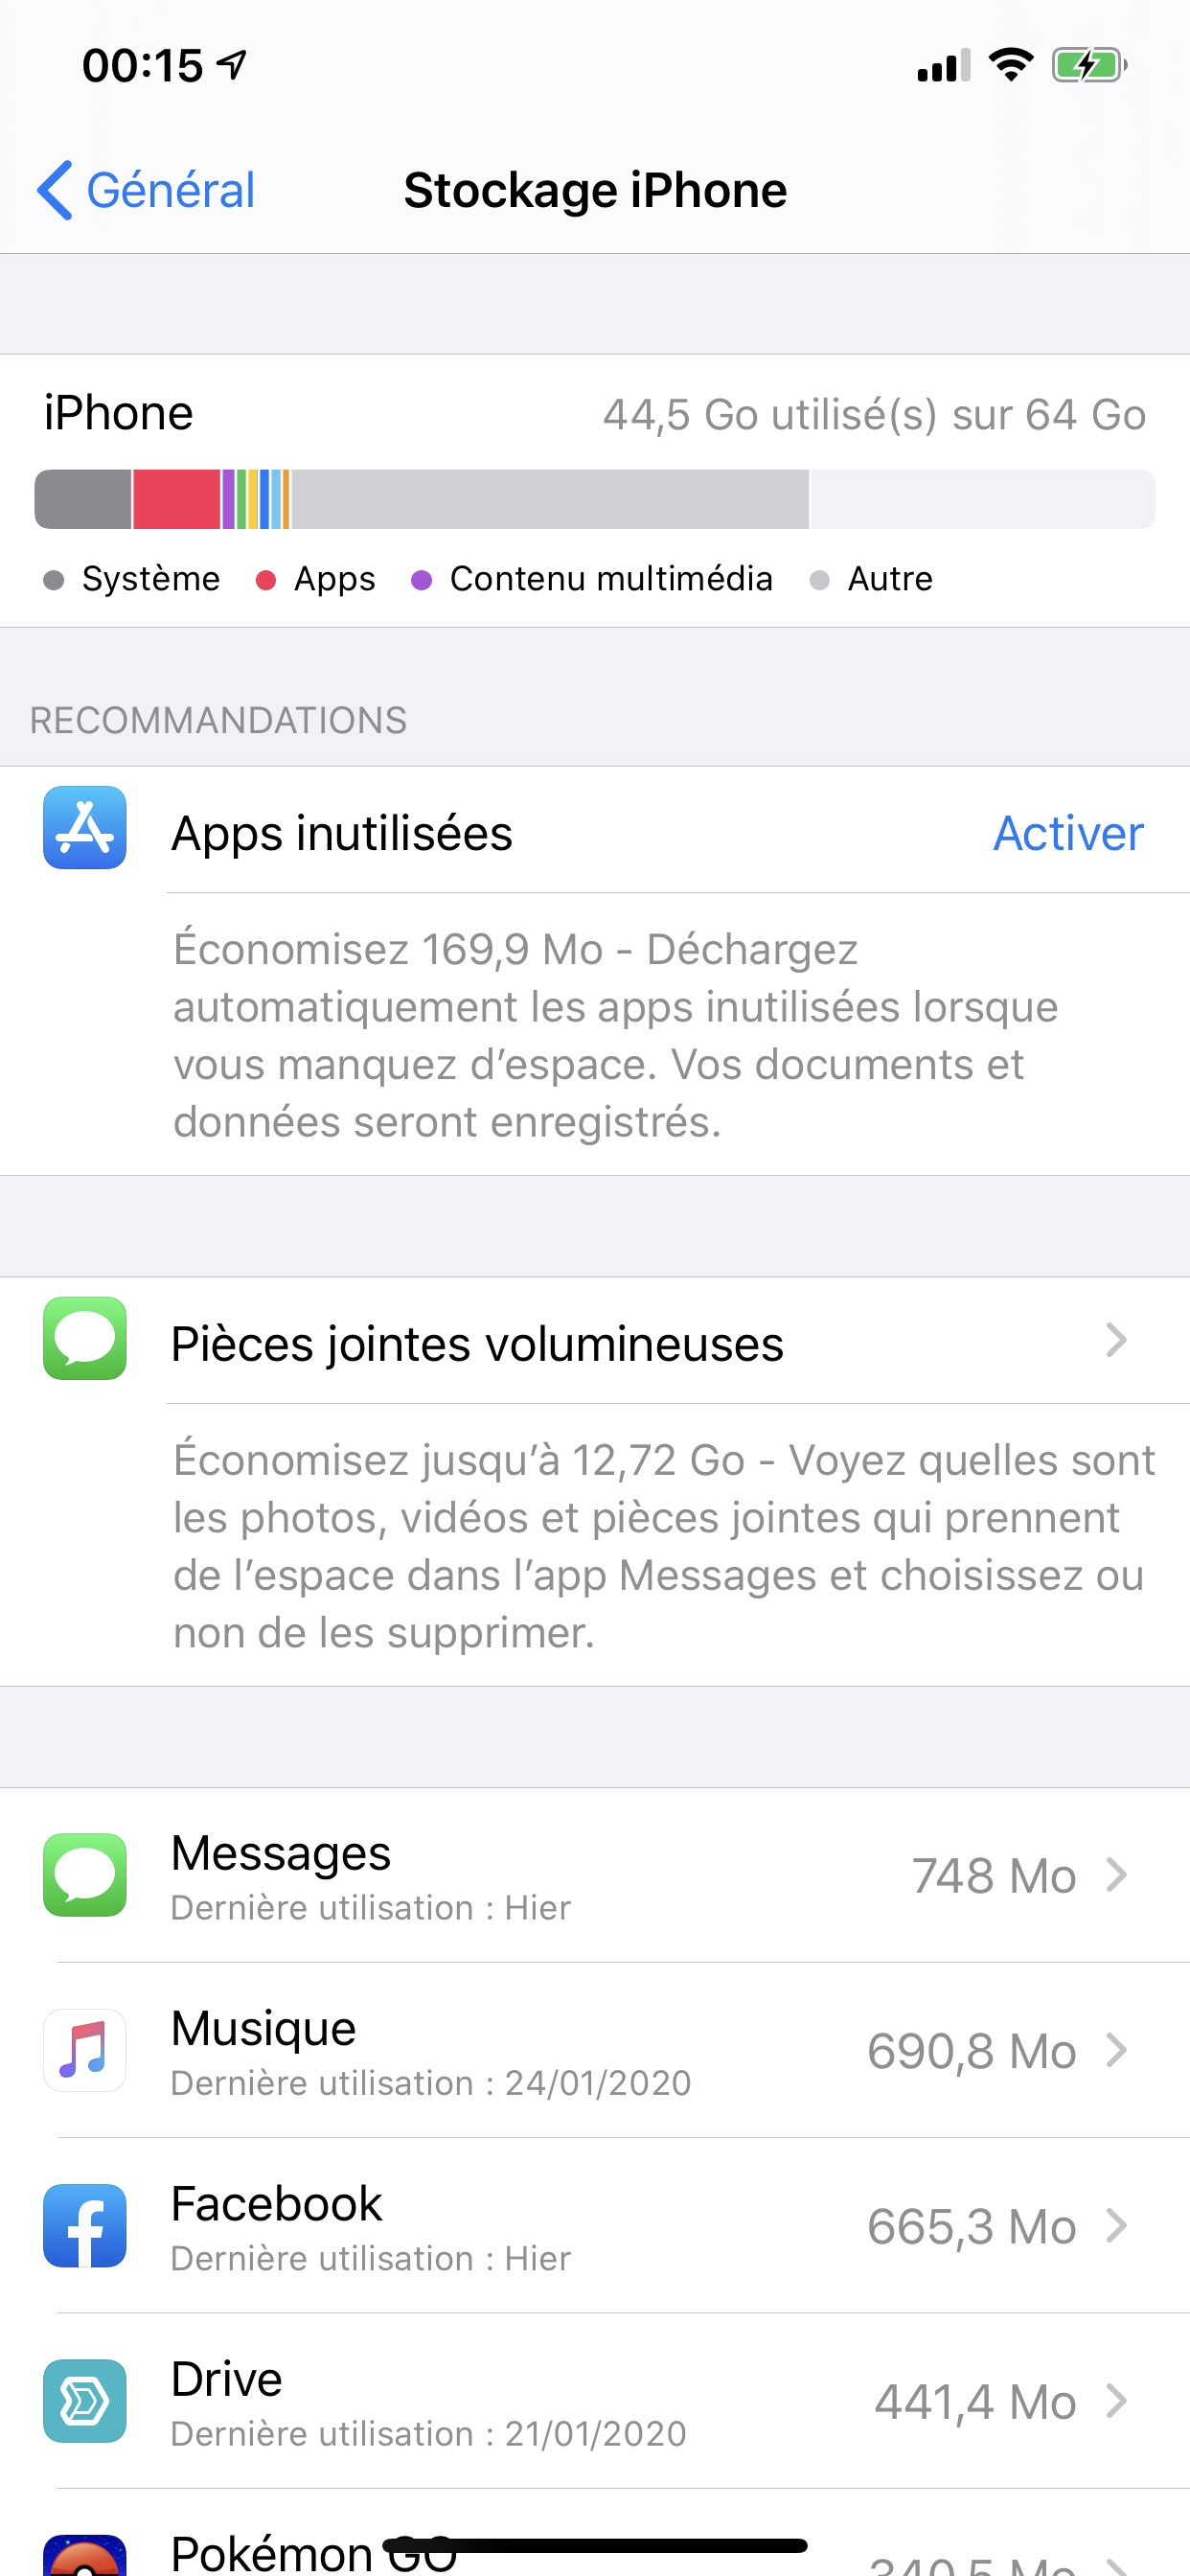 Stockage+iPhone+XS+Max+29+janvier+2020.j